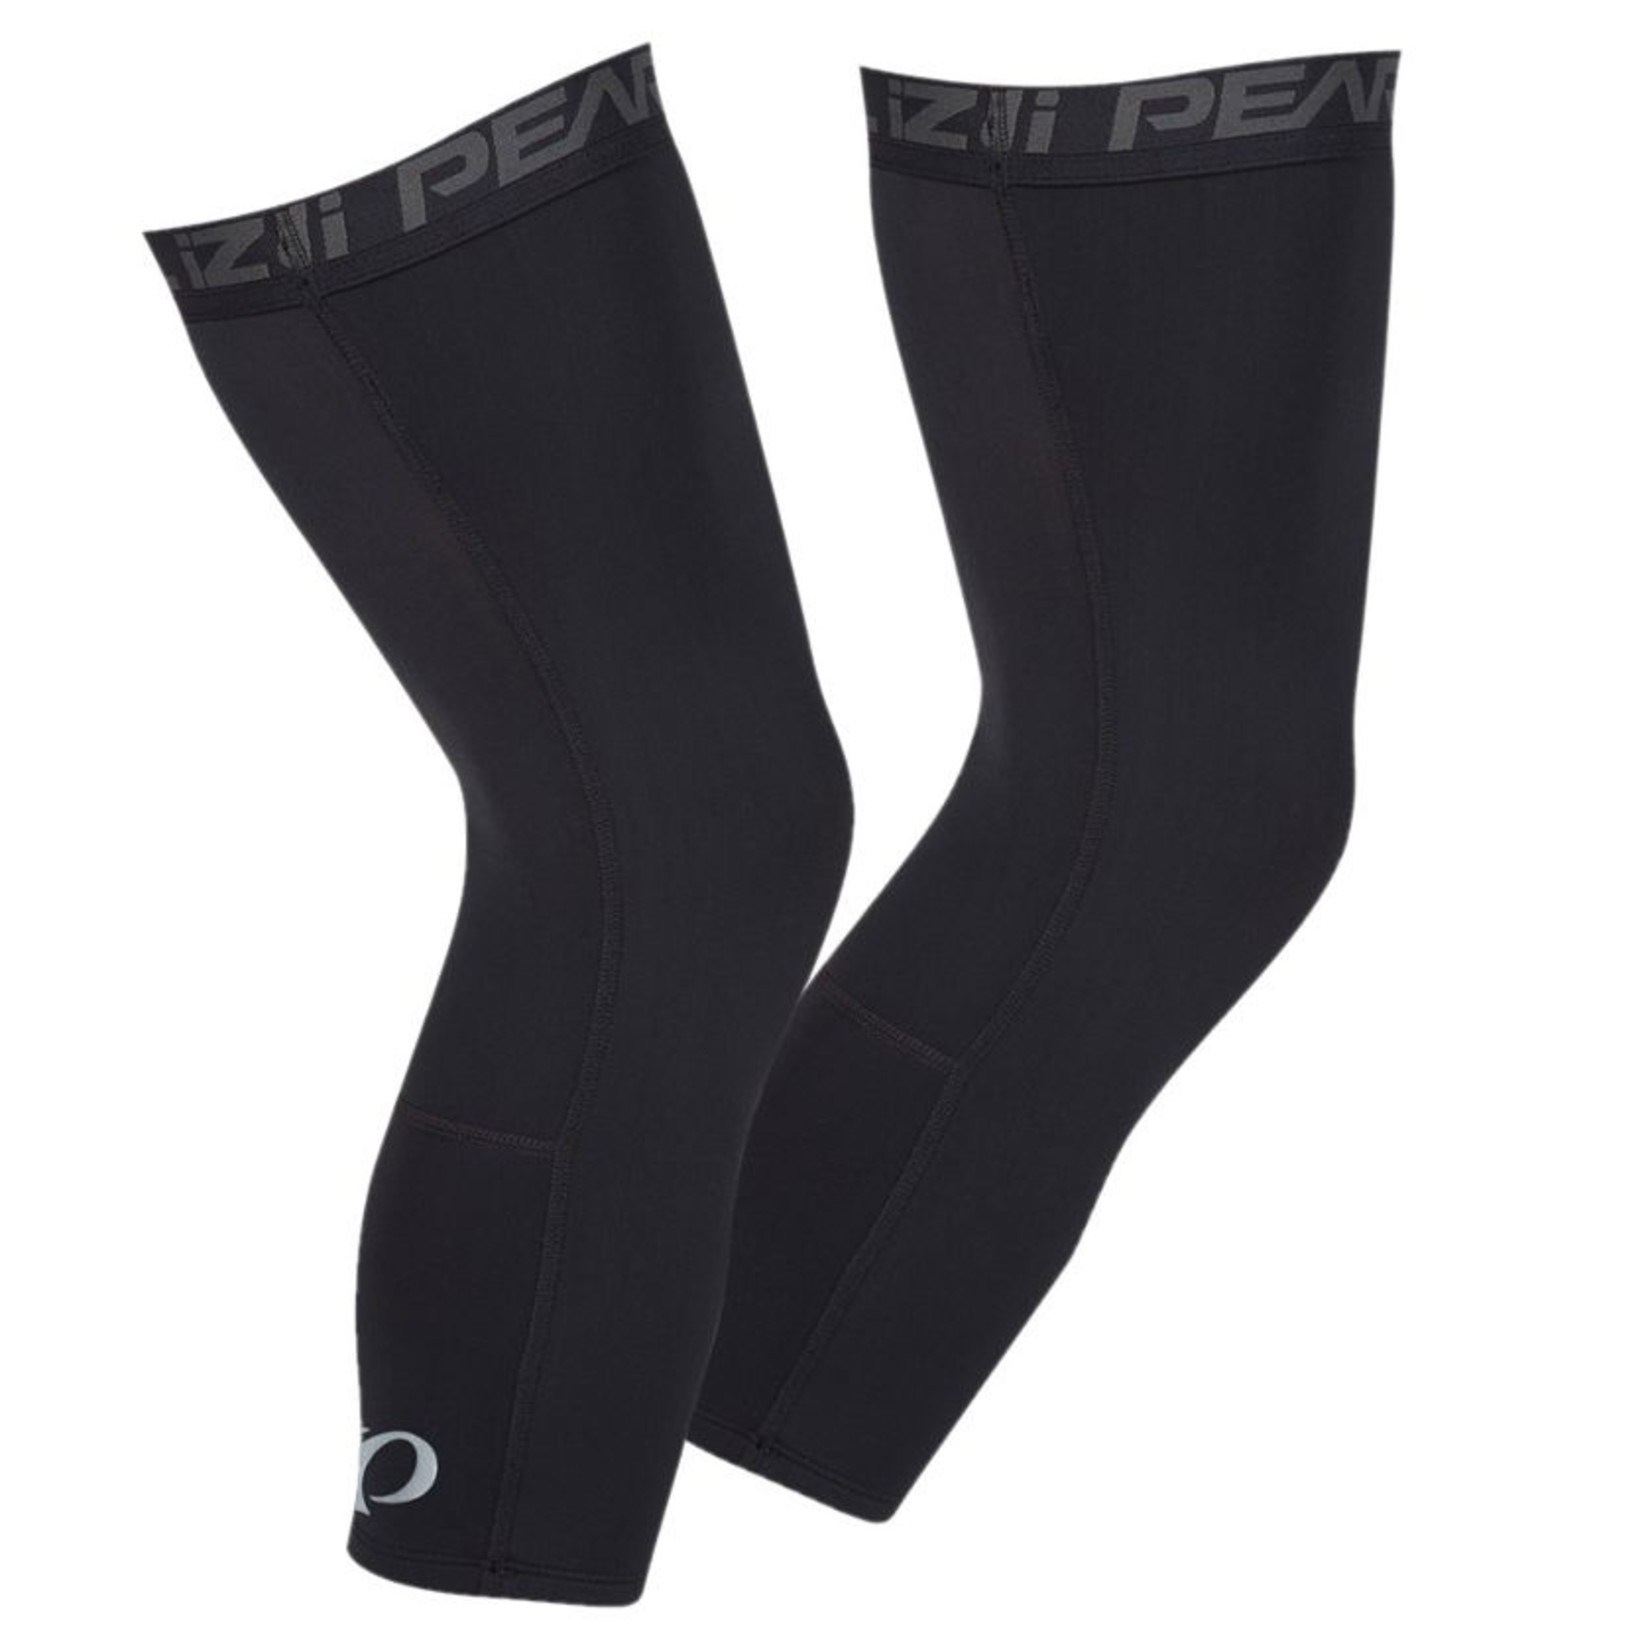 Pearl Izumi Pearl Izumi, Knee Warmer Elite Thermal Black Featuring PI Dry